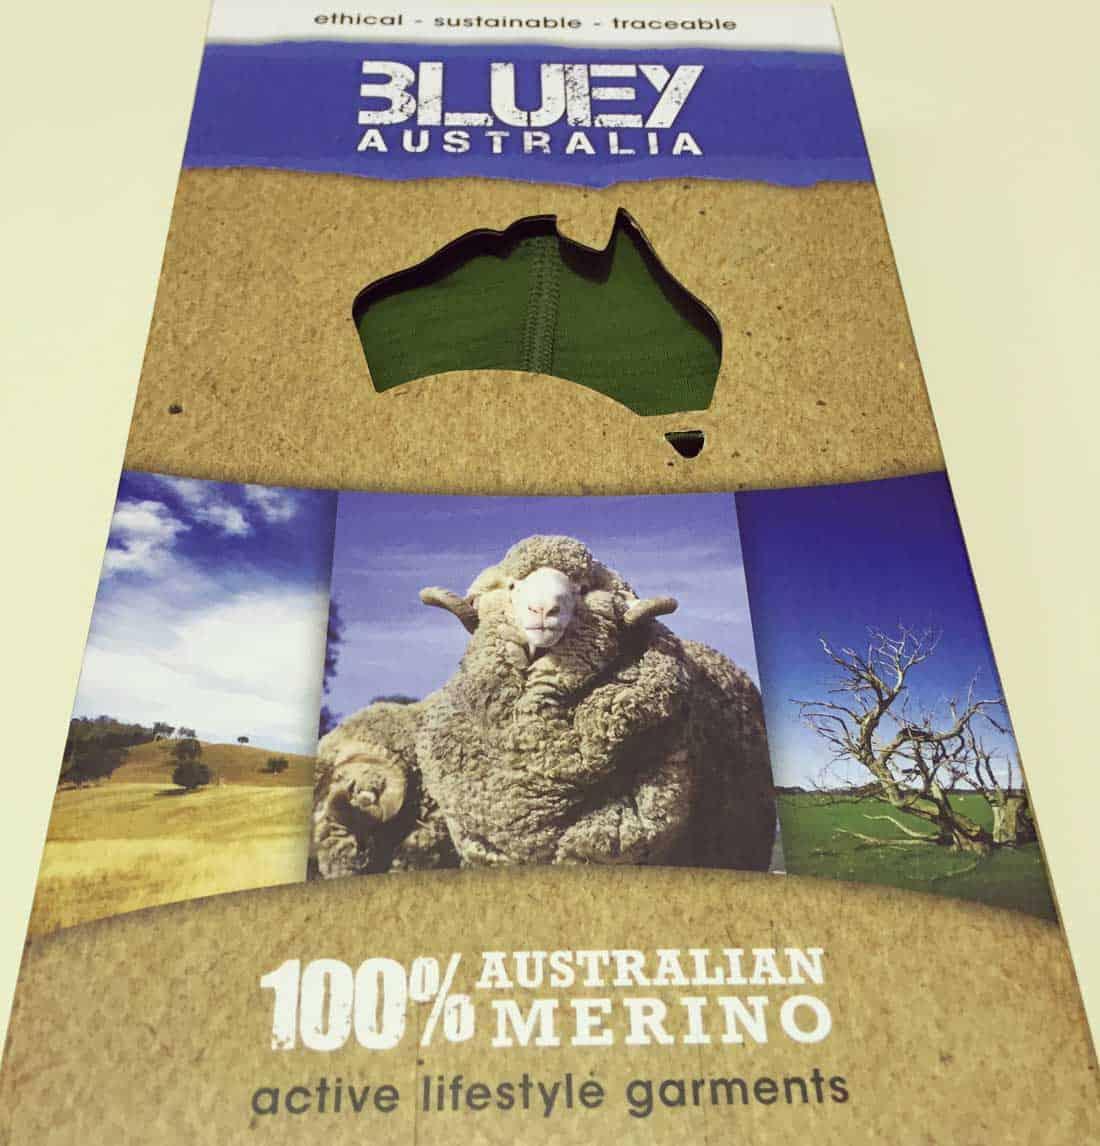 BLUEY-Packaging